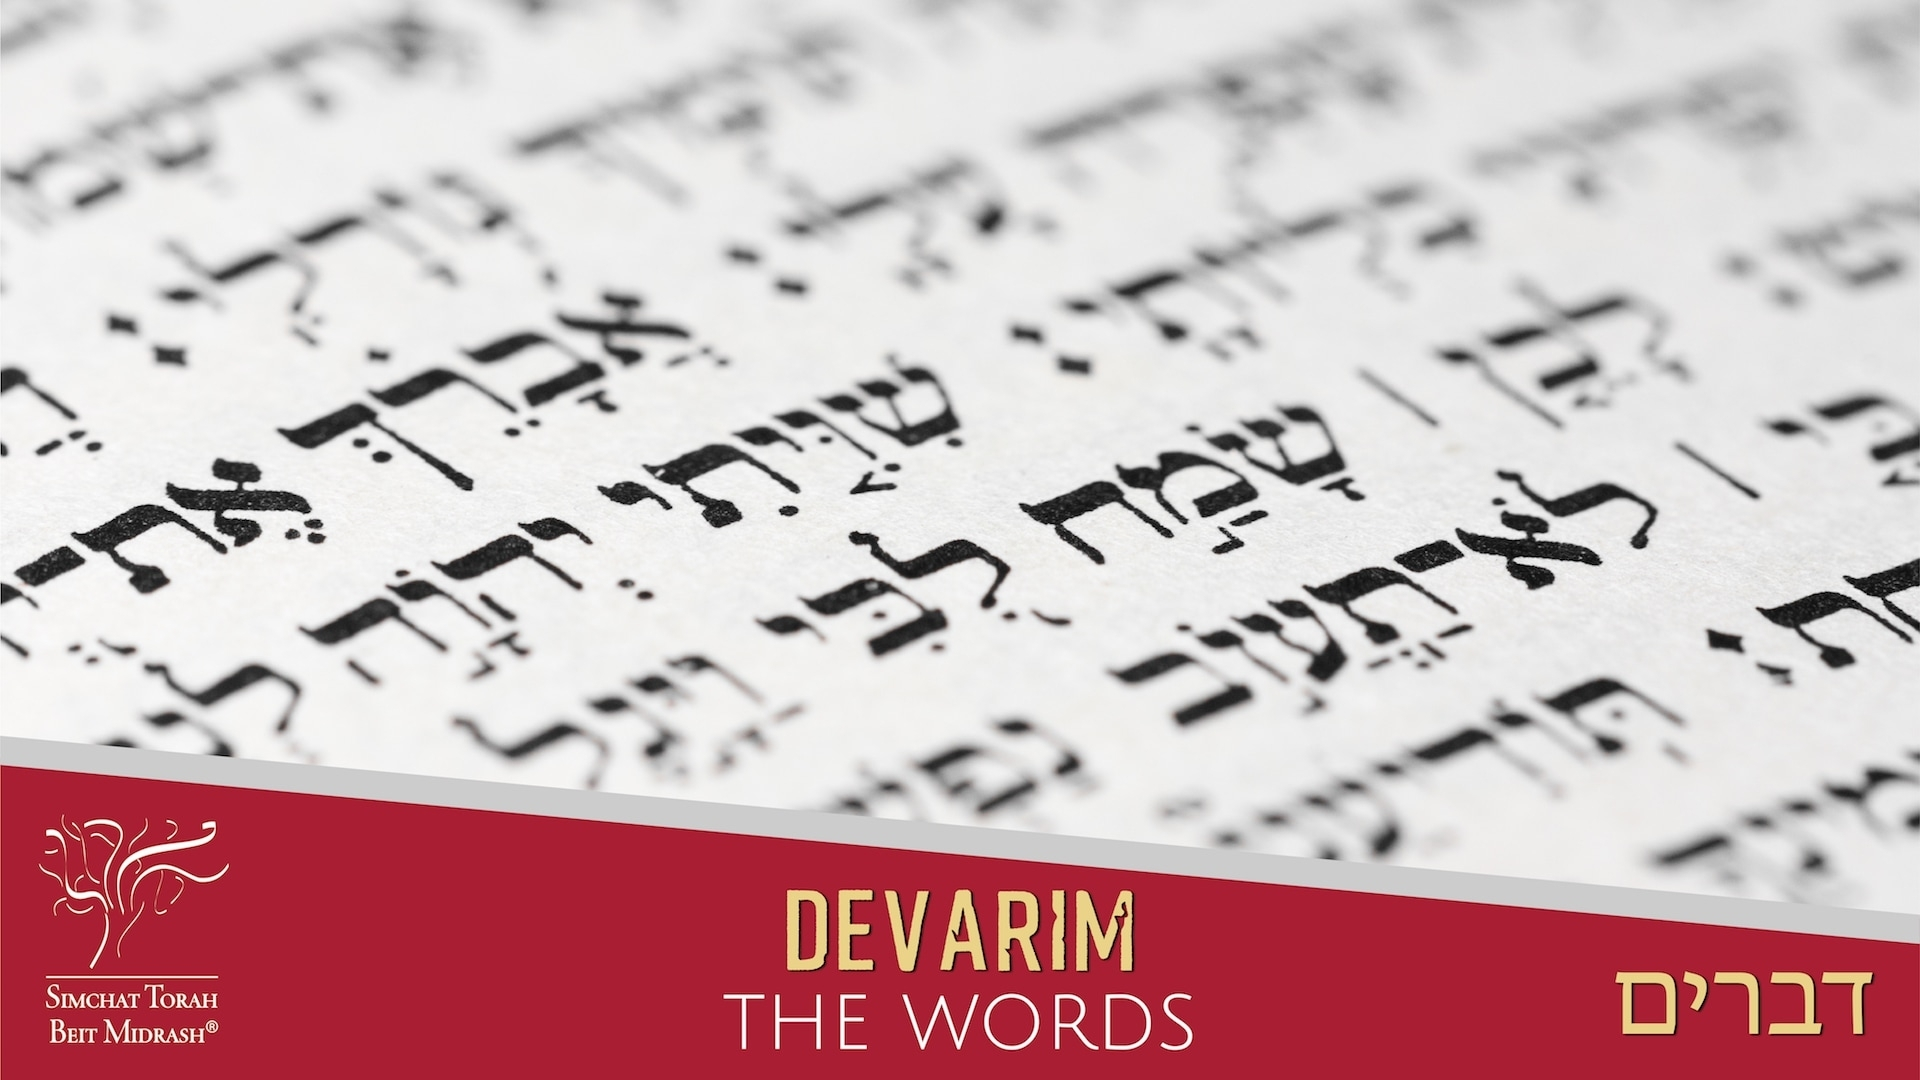 Devarim - Simchat Torah Beit Midrash with regard to This Week's Torah Portion 2019